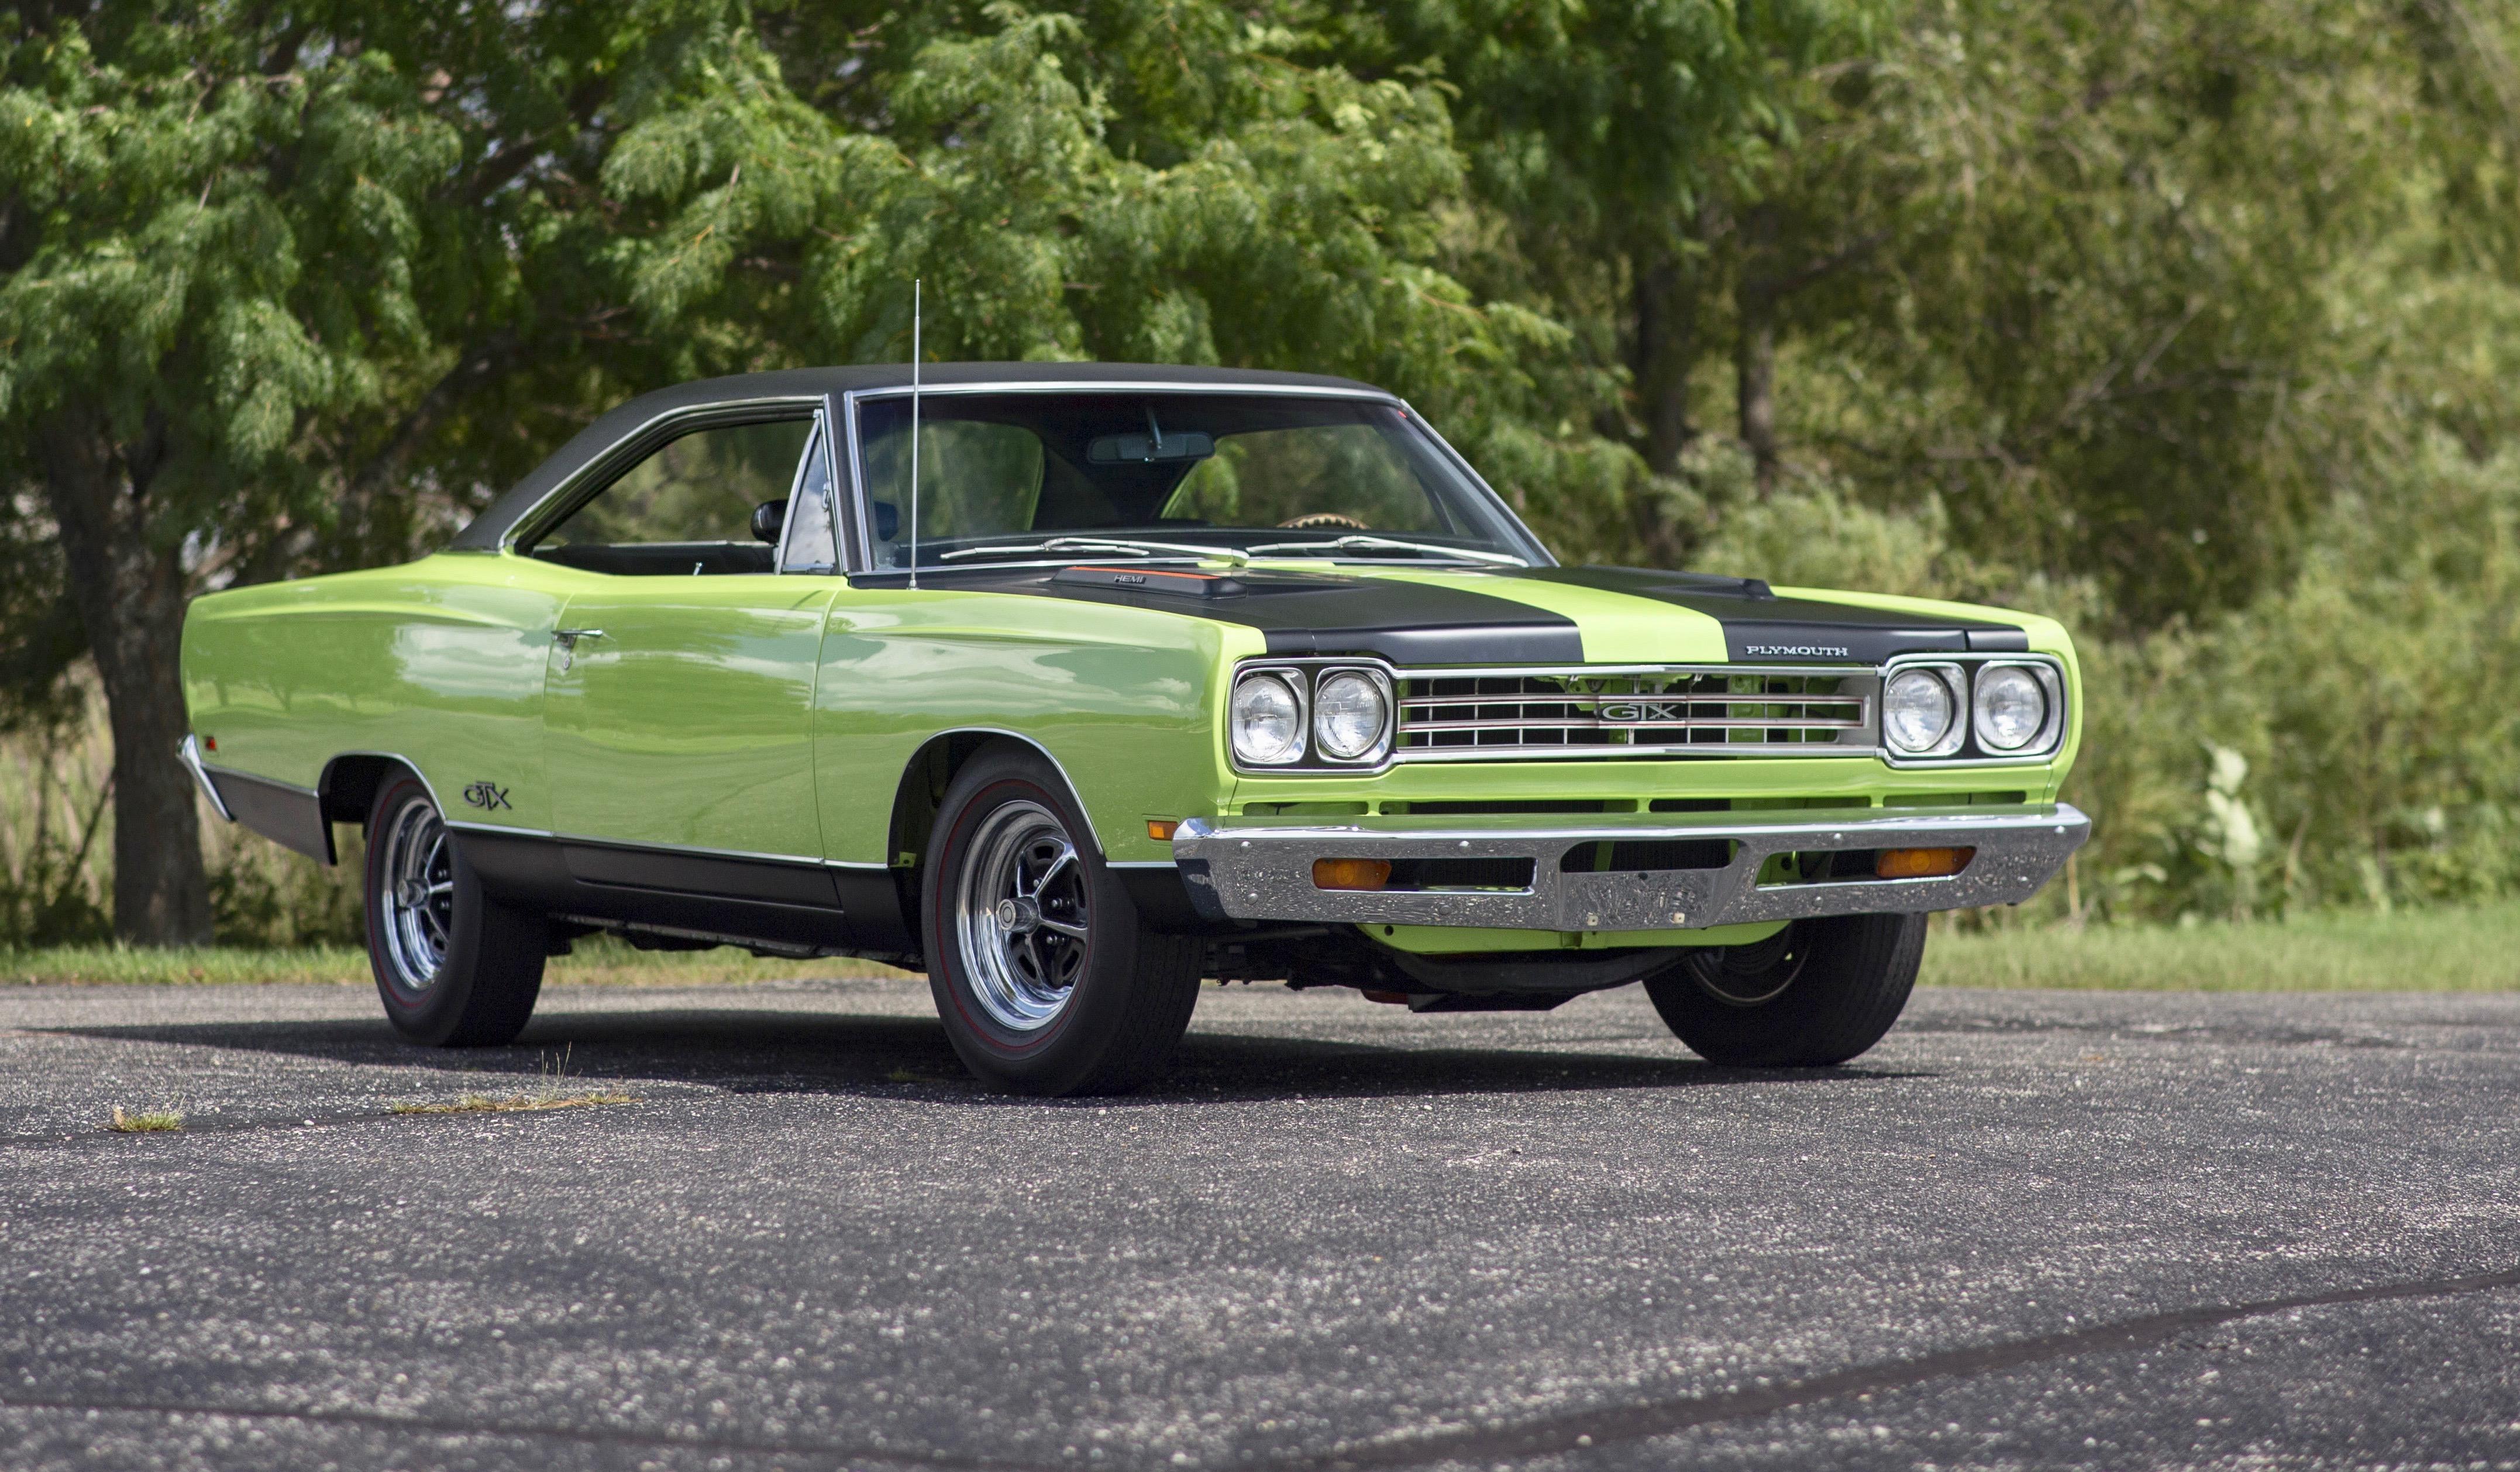 Modern Muscle Cars Top Mecum's Louisville Auction